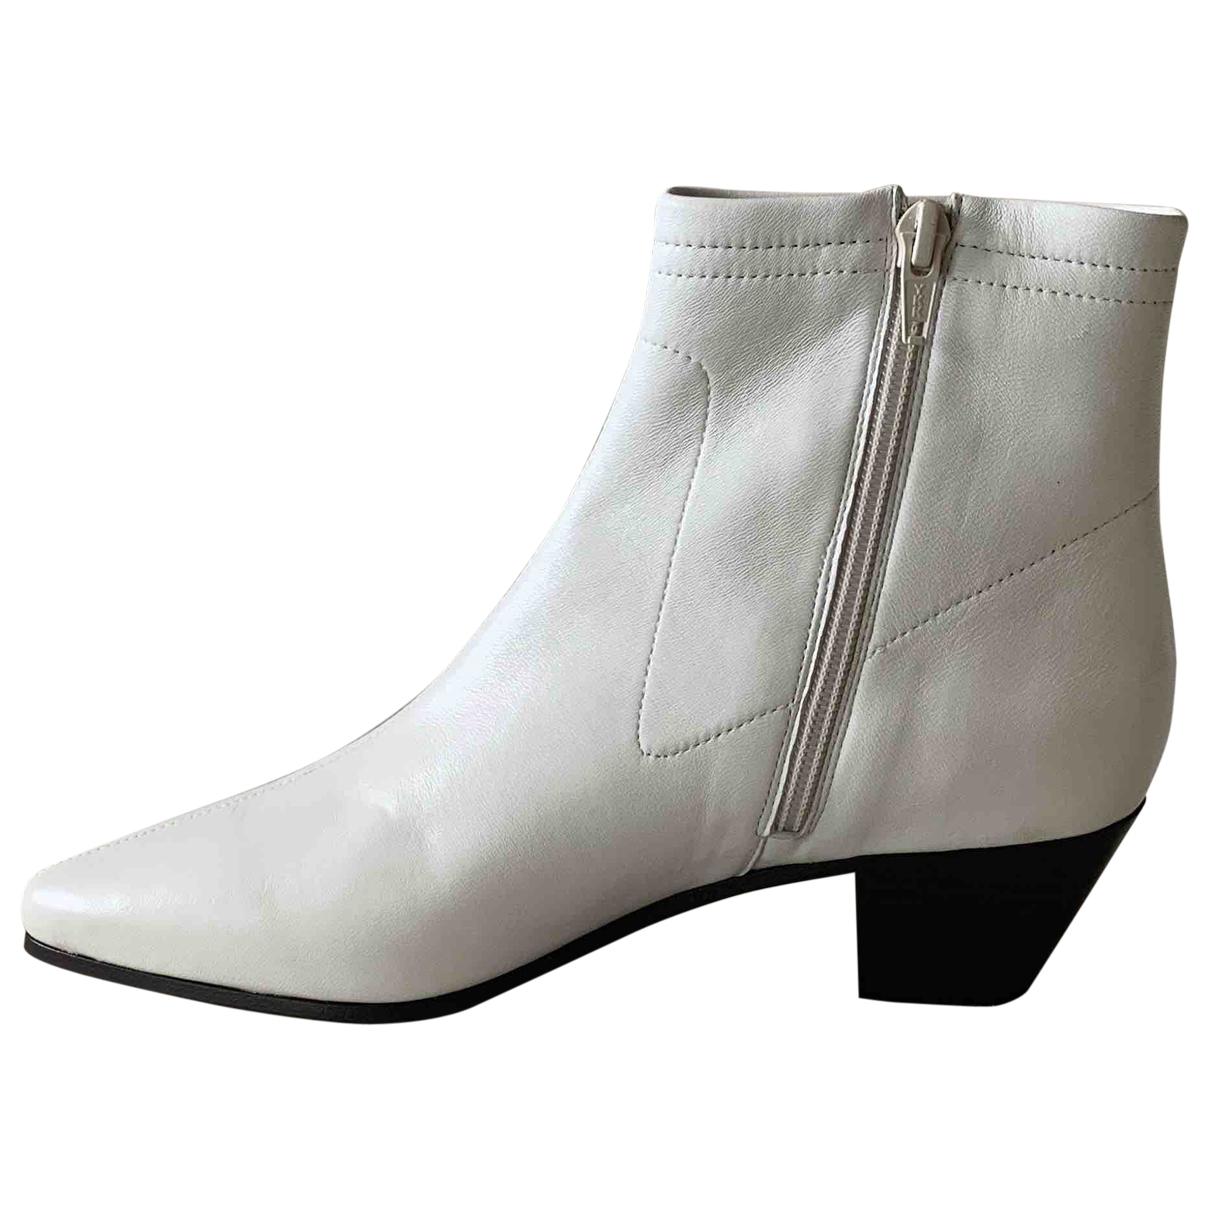 Maje - Boots Spring Summer 2020 pour femme en cuir - blanc